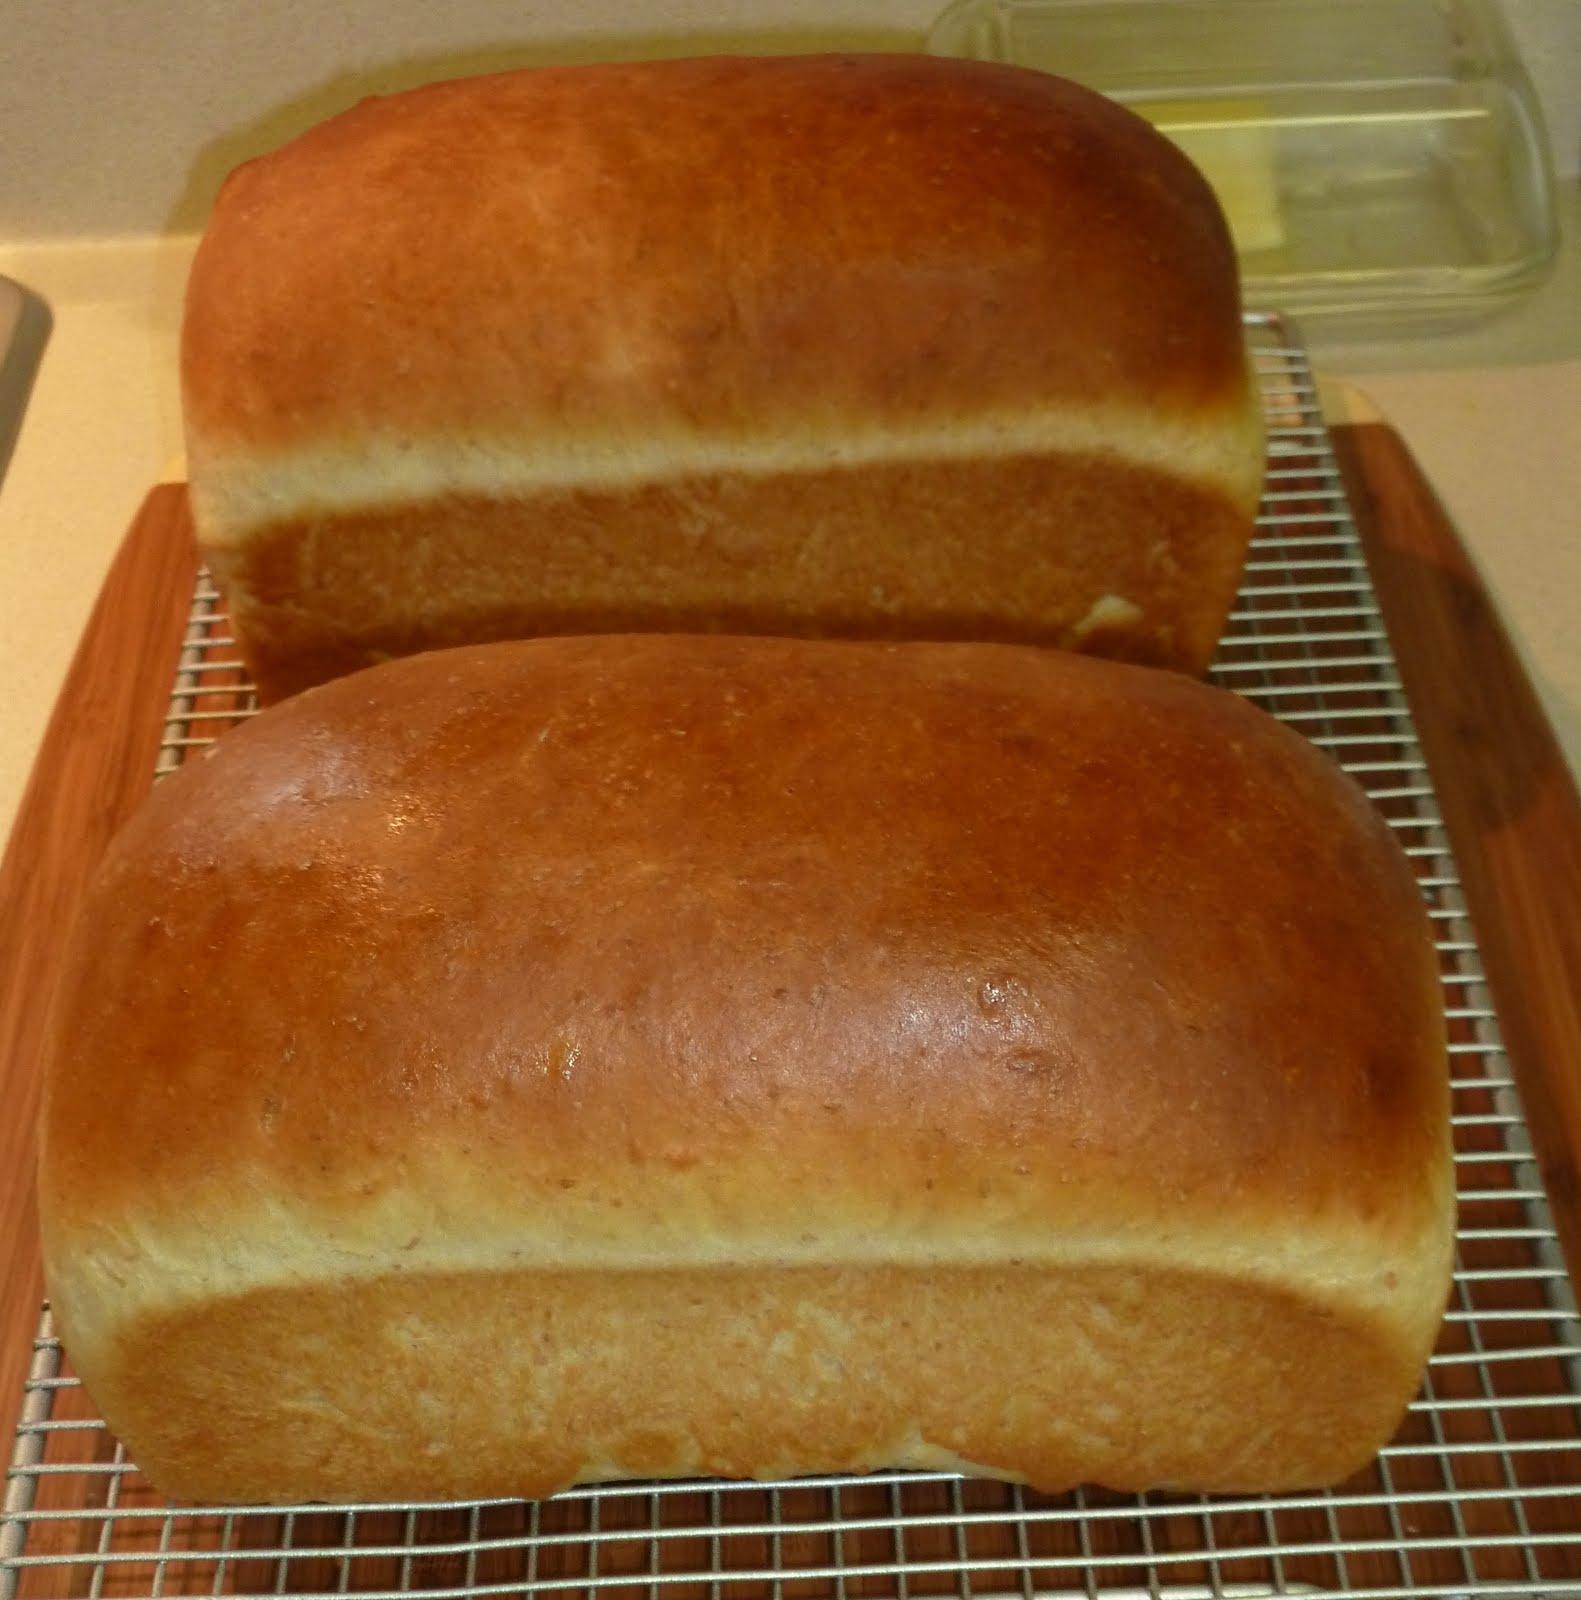 The Iowa Housewife: Basic Potato Yeast Bread